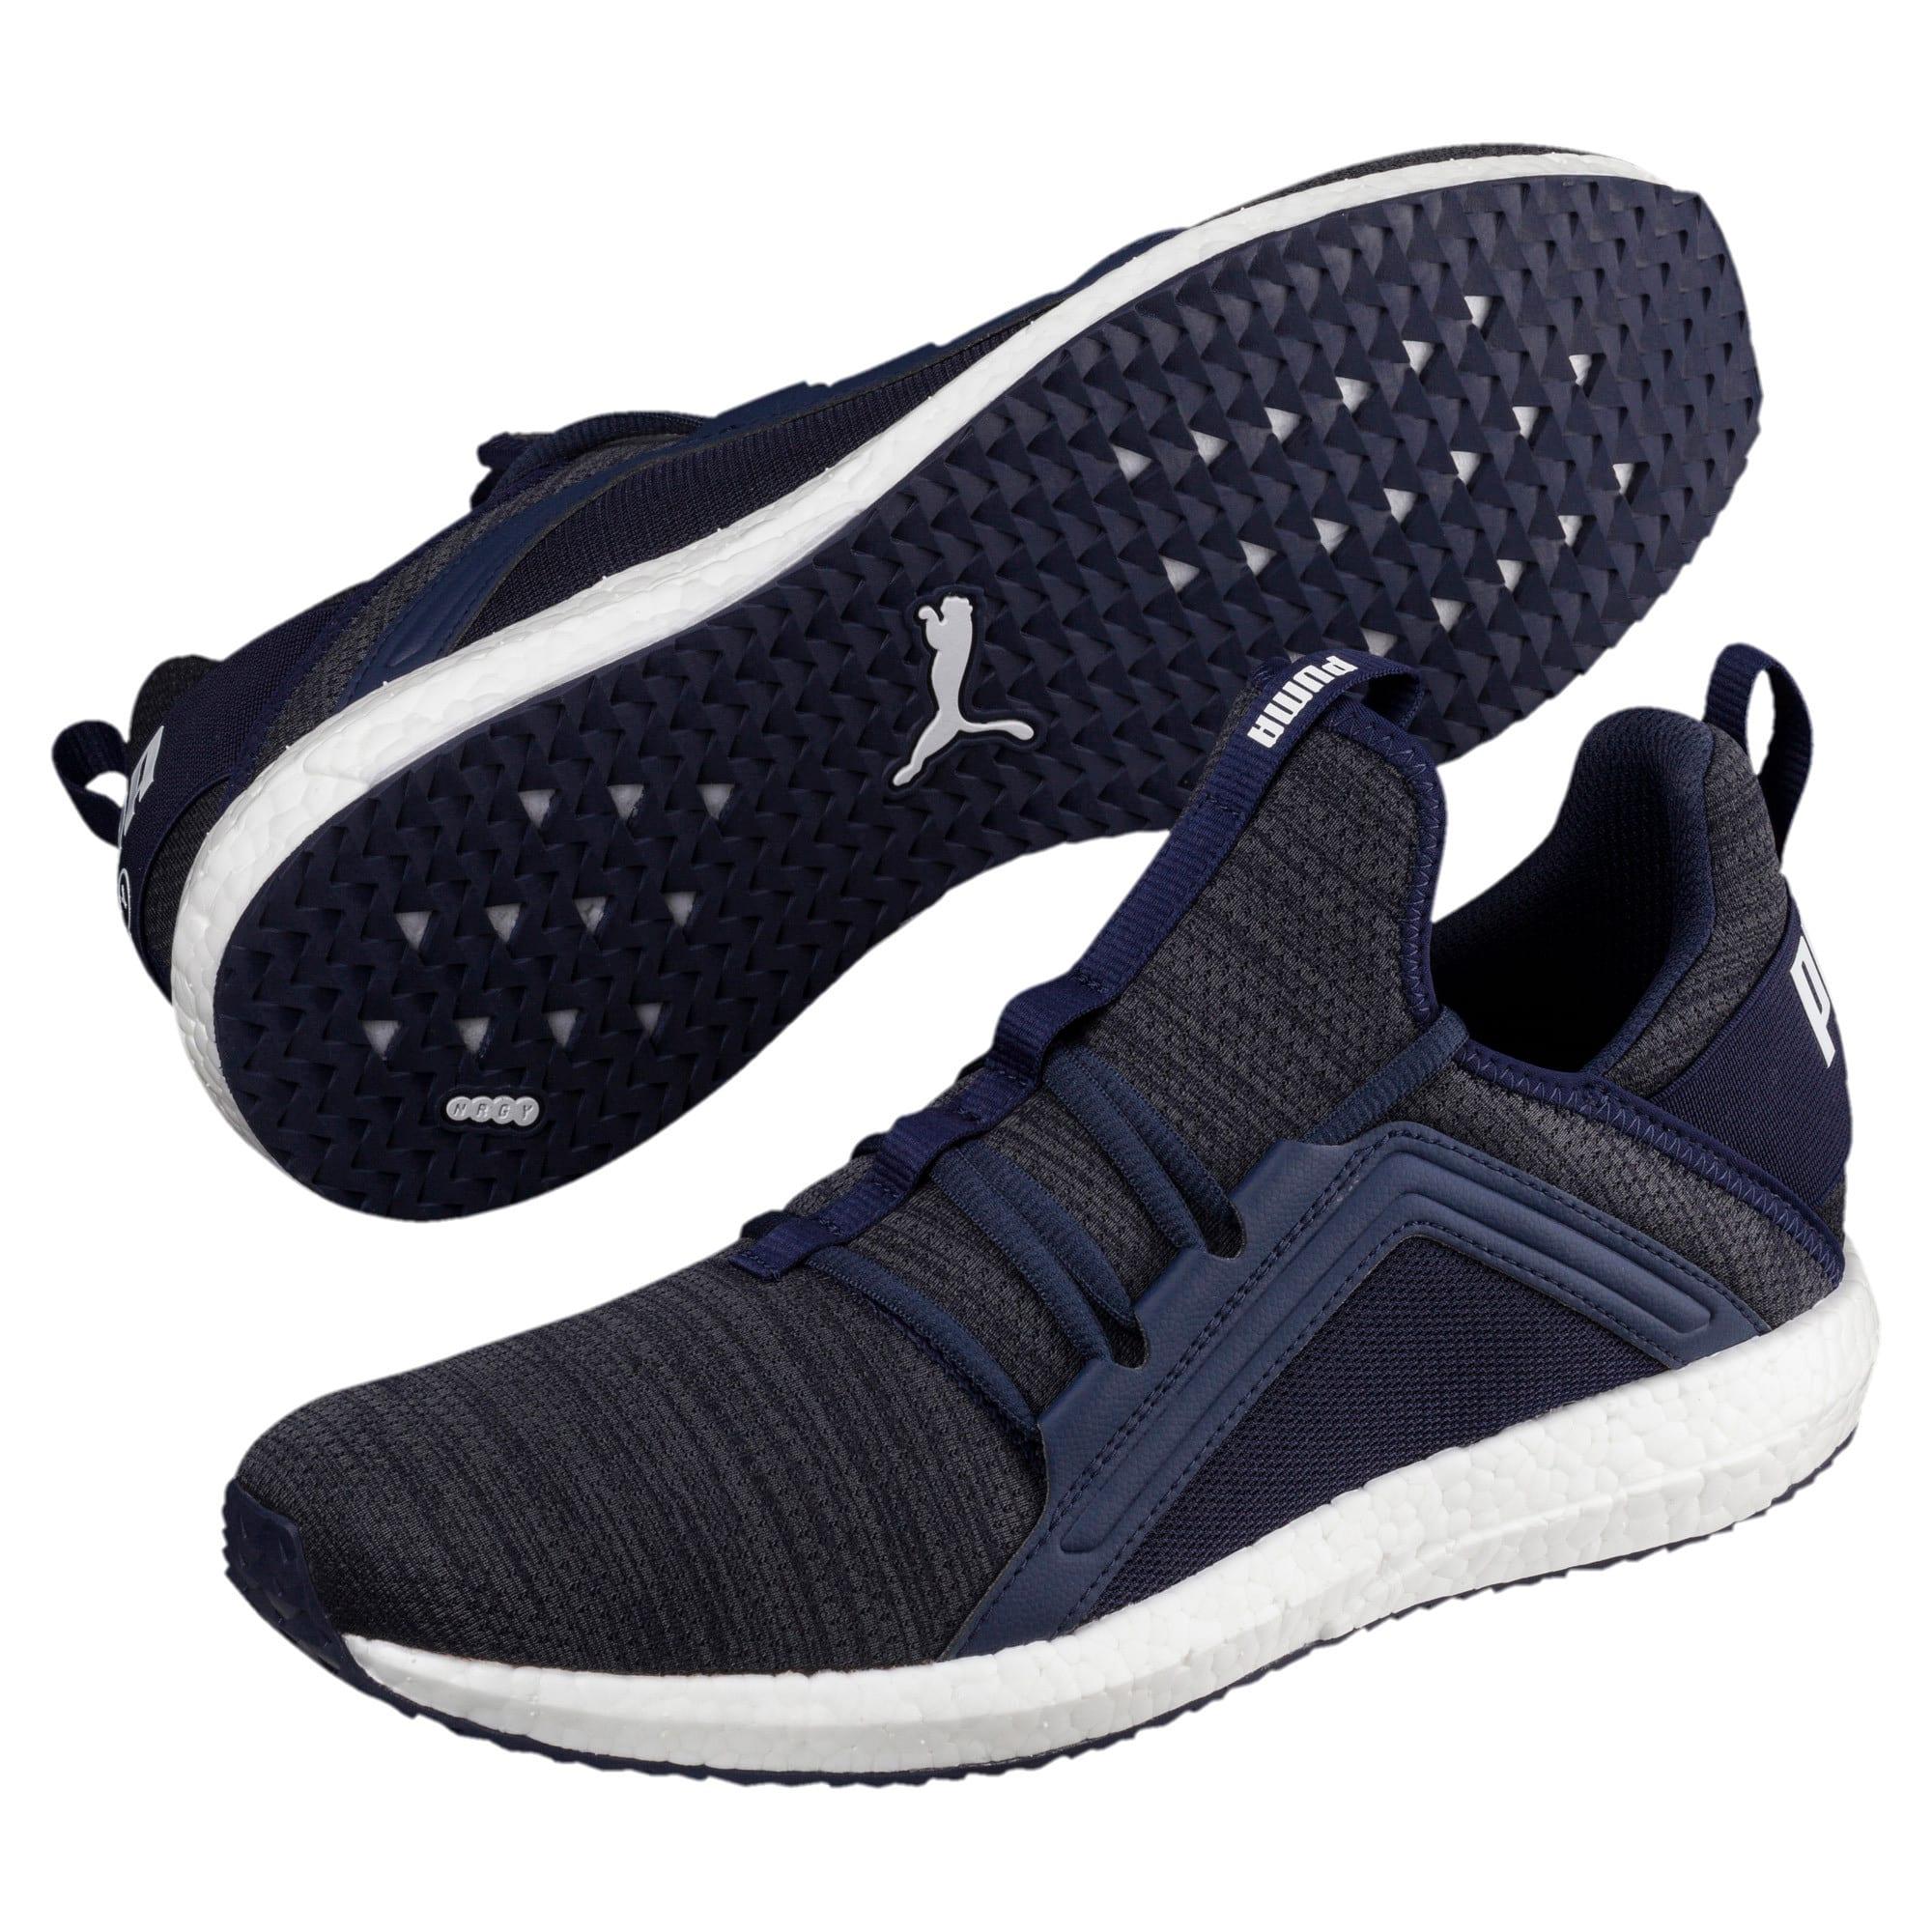 Miniatura 2 de Zapatos para correr Mega NRGY  Heather Knit para hombre, Peacoat-Iron Gate-Blanco, mediano